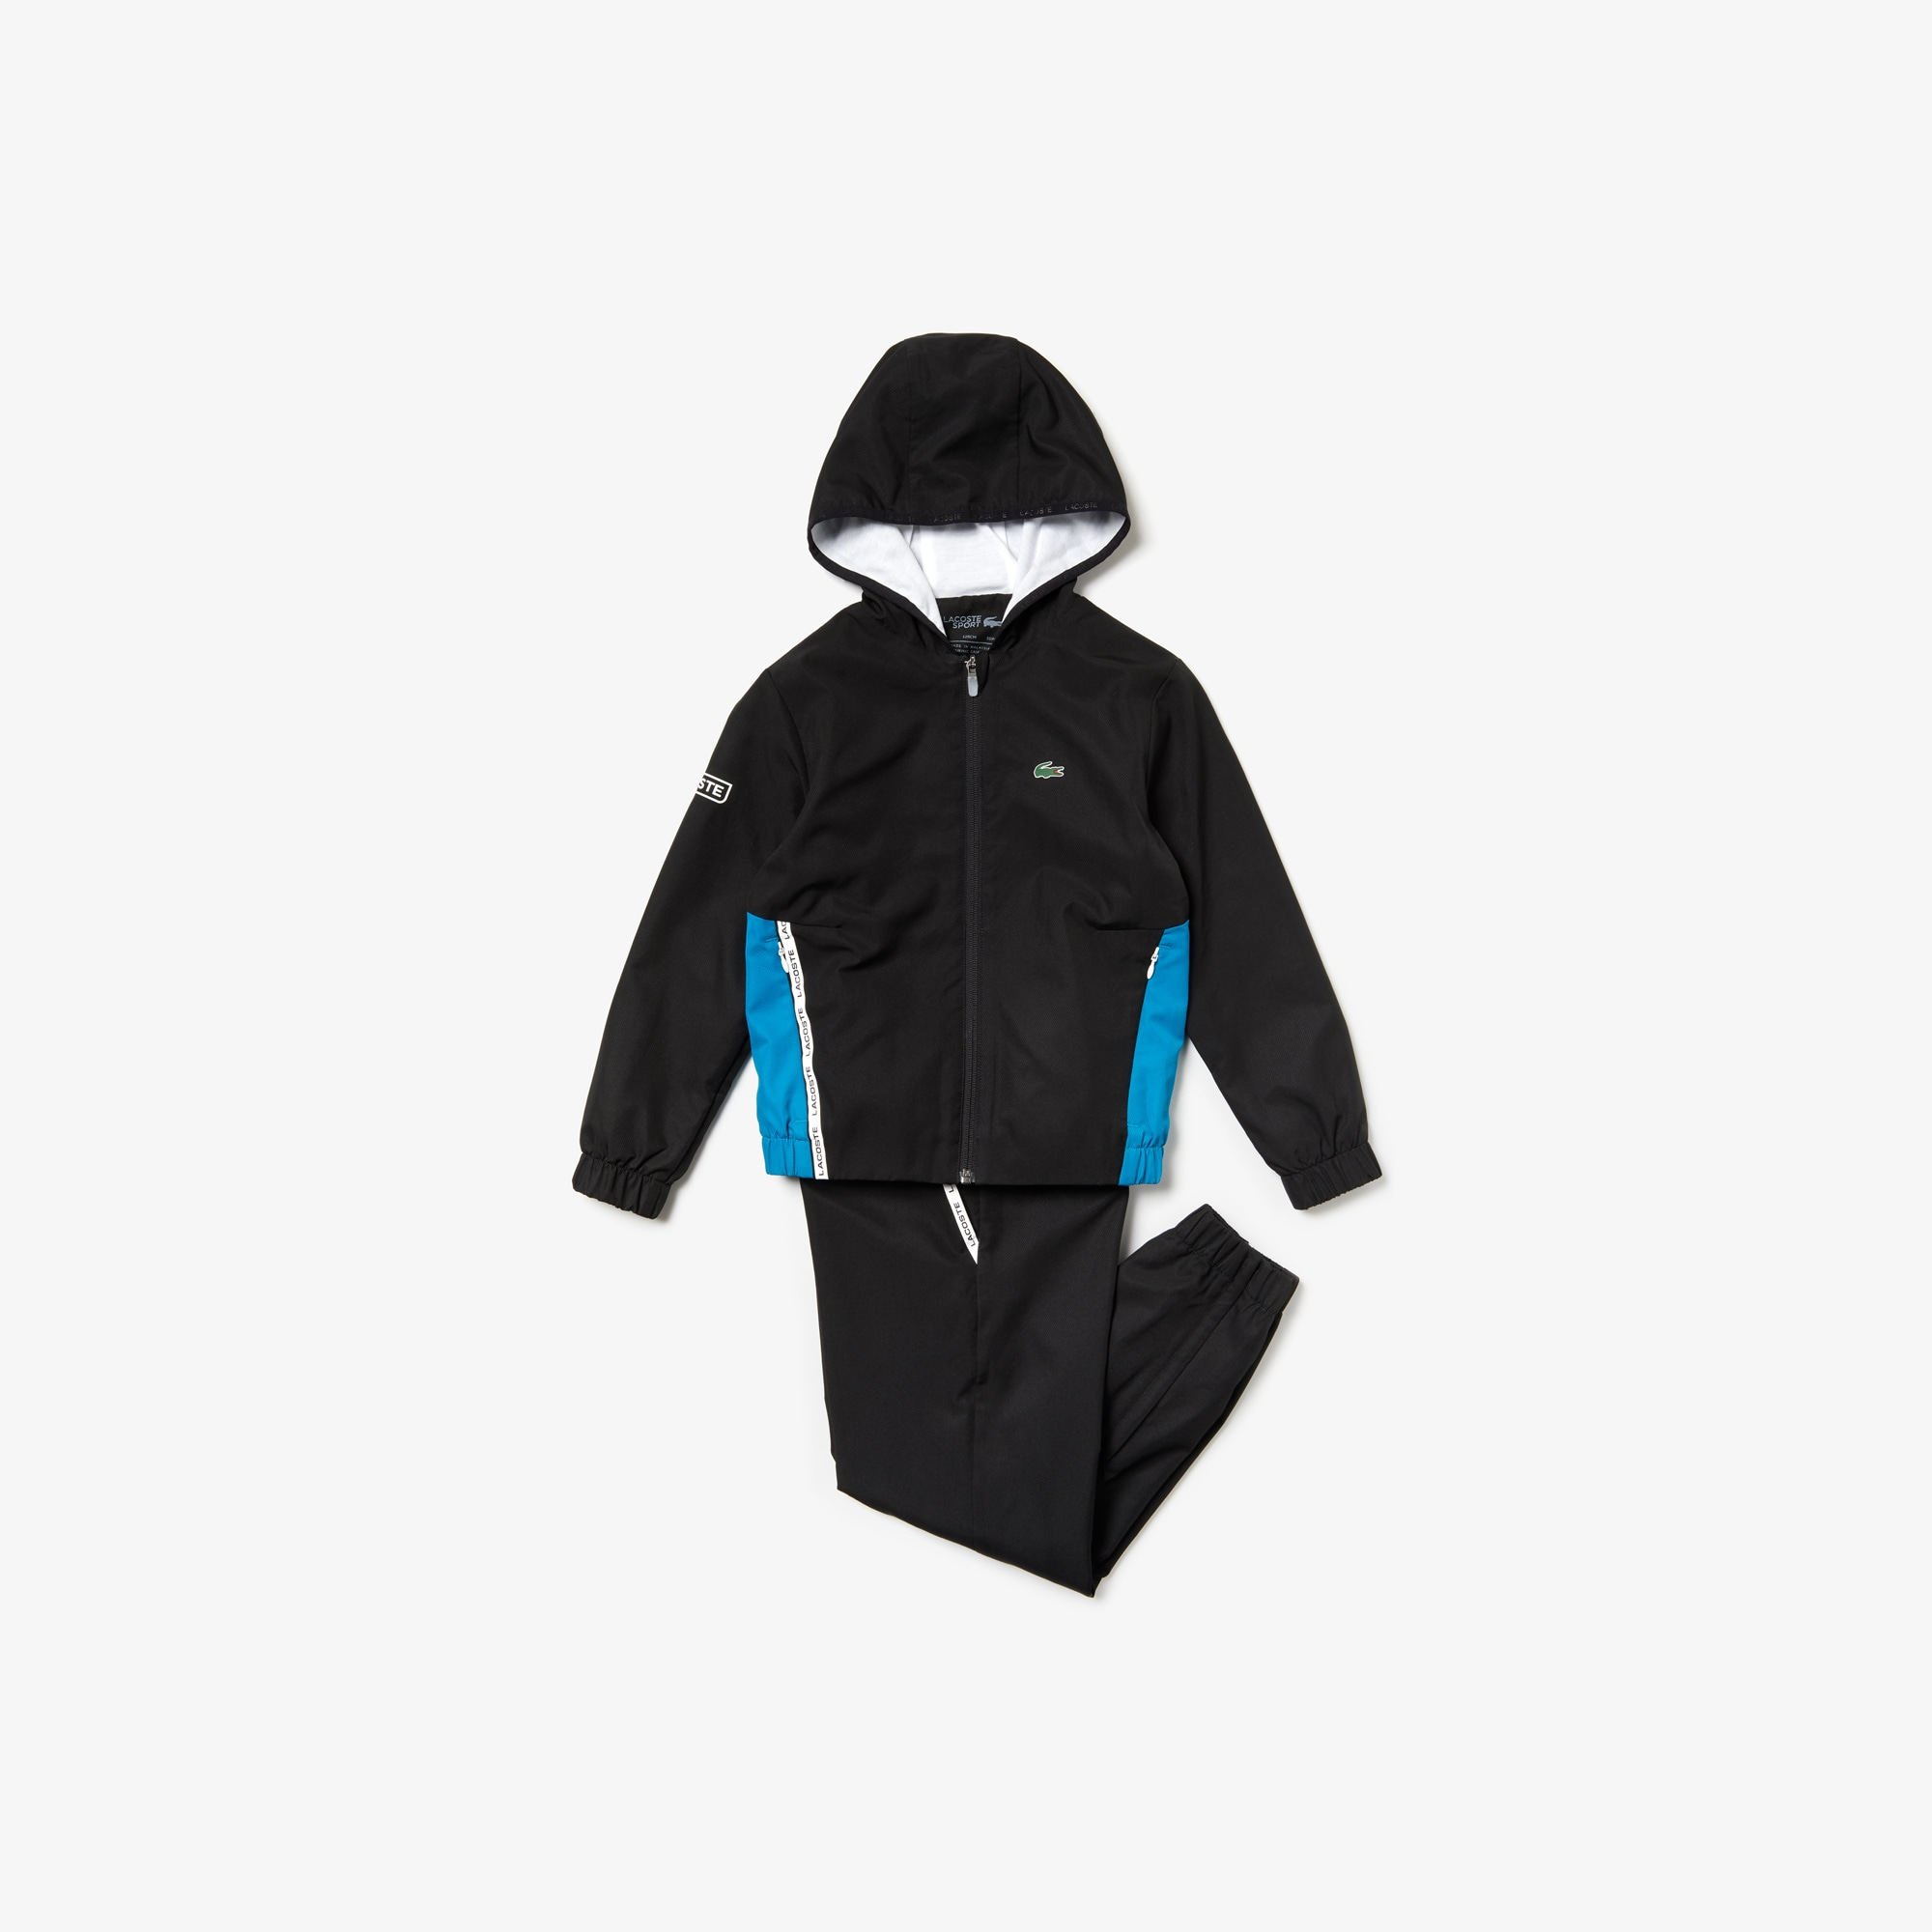 sale retailer 40b6a 0dc26 Kinder Trainingsanzüge   Kinder Sportbekleidung   LACOSTE SPORT